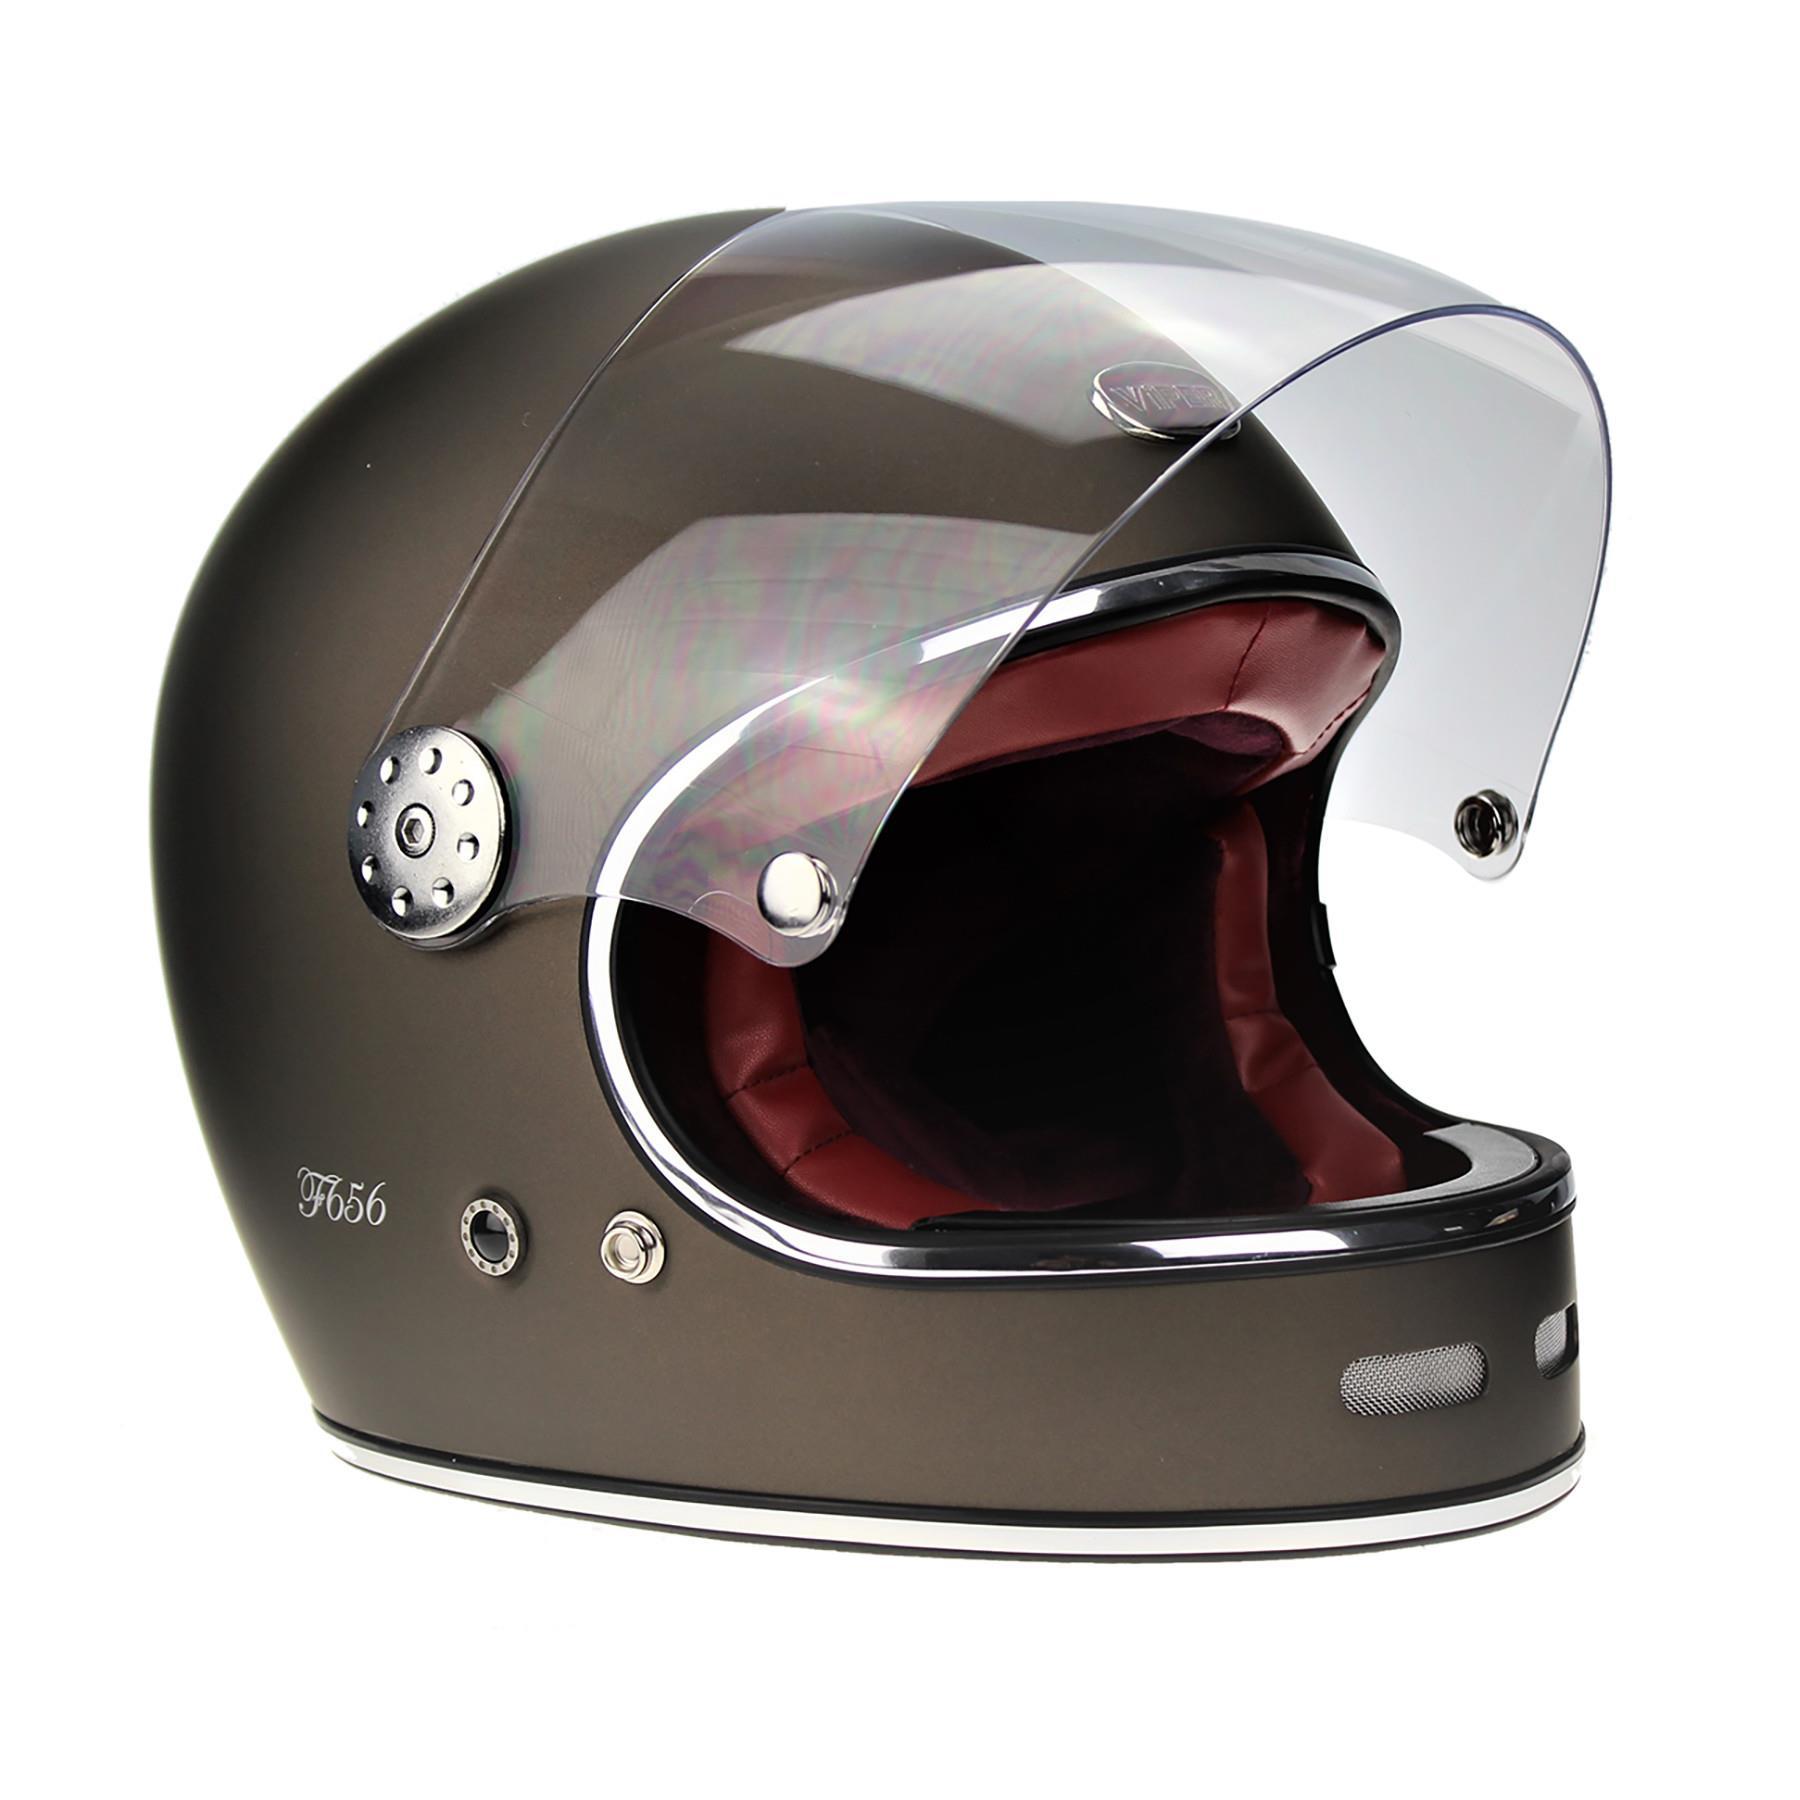 Viper-F656-Retro-Vintage-FibreGlass-Full-Face-Motorcycle-Bike-Road-Crash-Helmet miniature 27